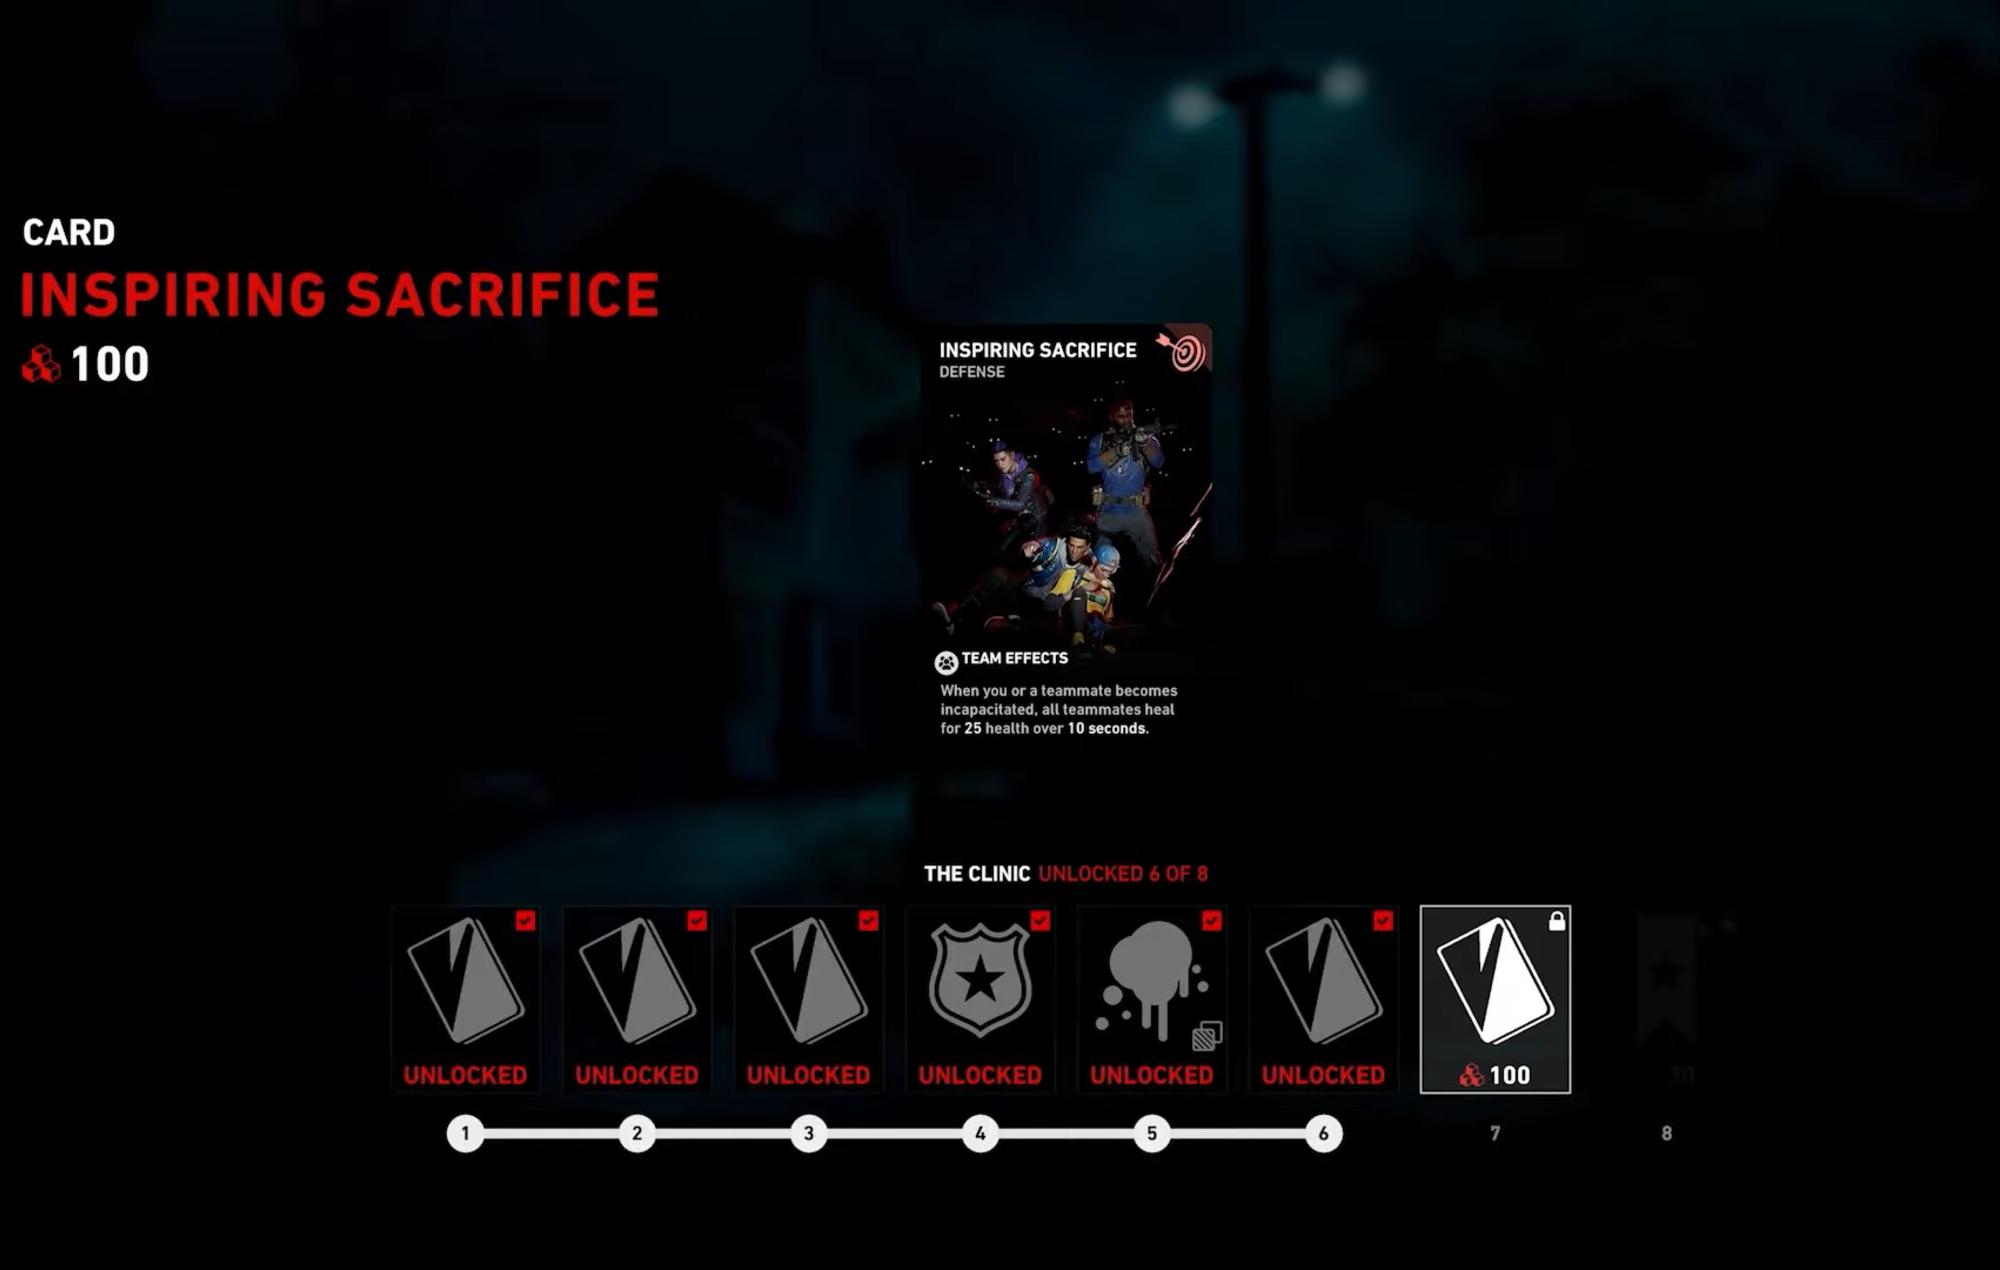 Back 4 Blood Inspiring Sacrifice